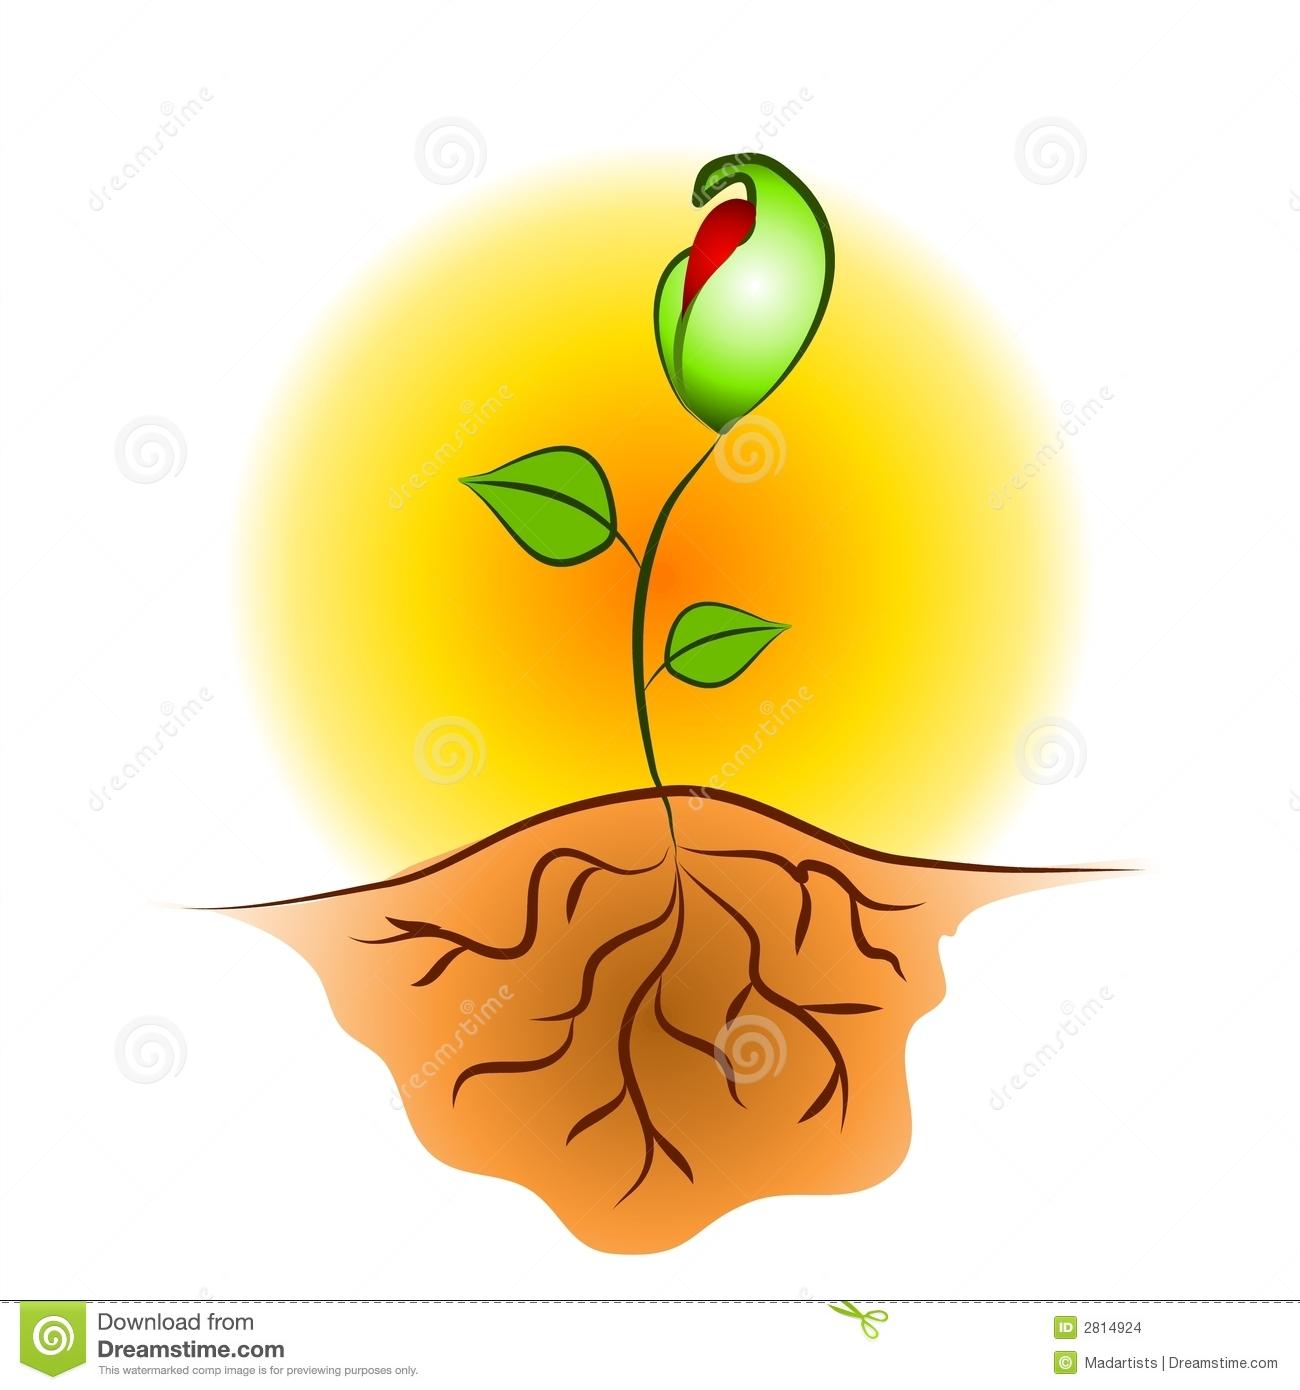 Plant clip art images svg library download From Seed To Plant Clipart - Clipart Kid svg library download